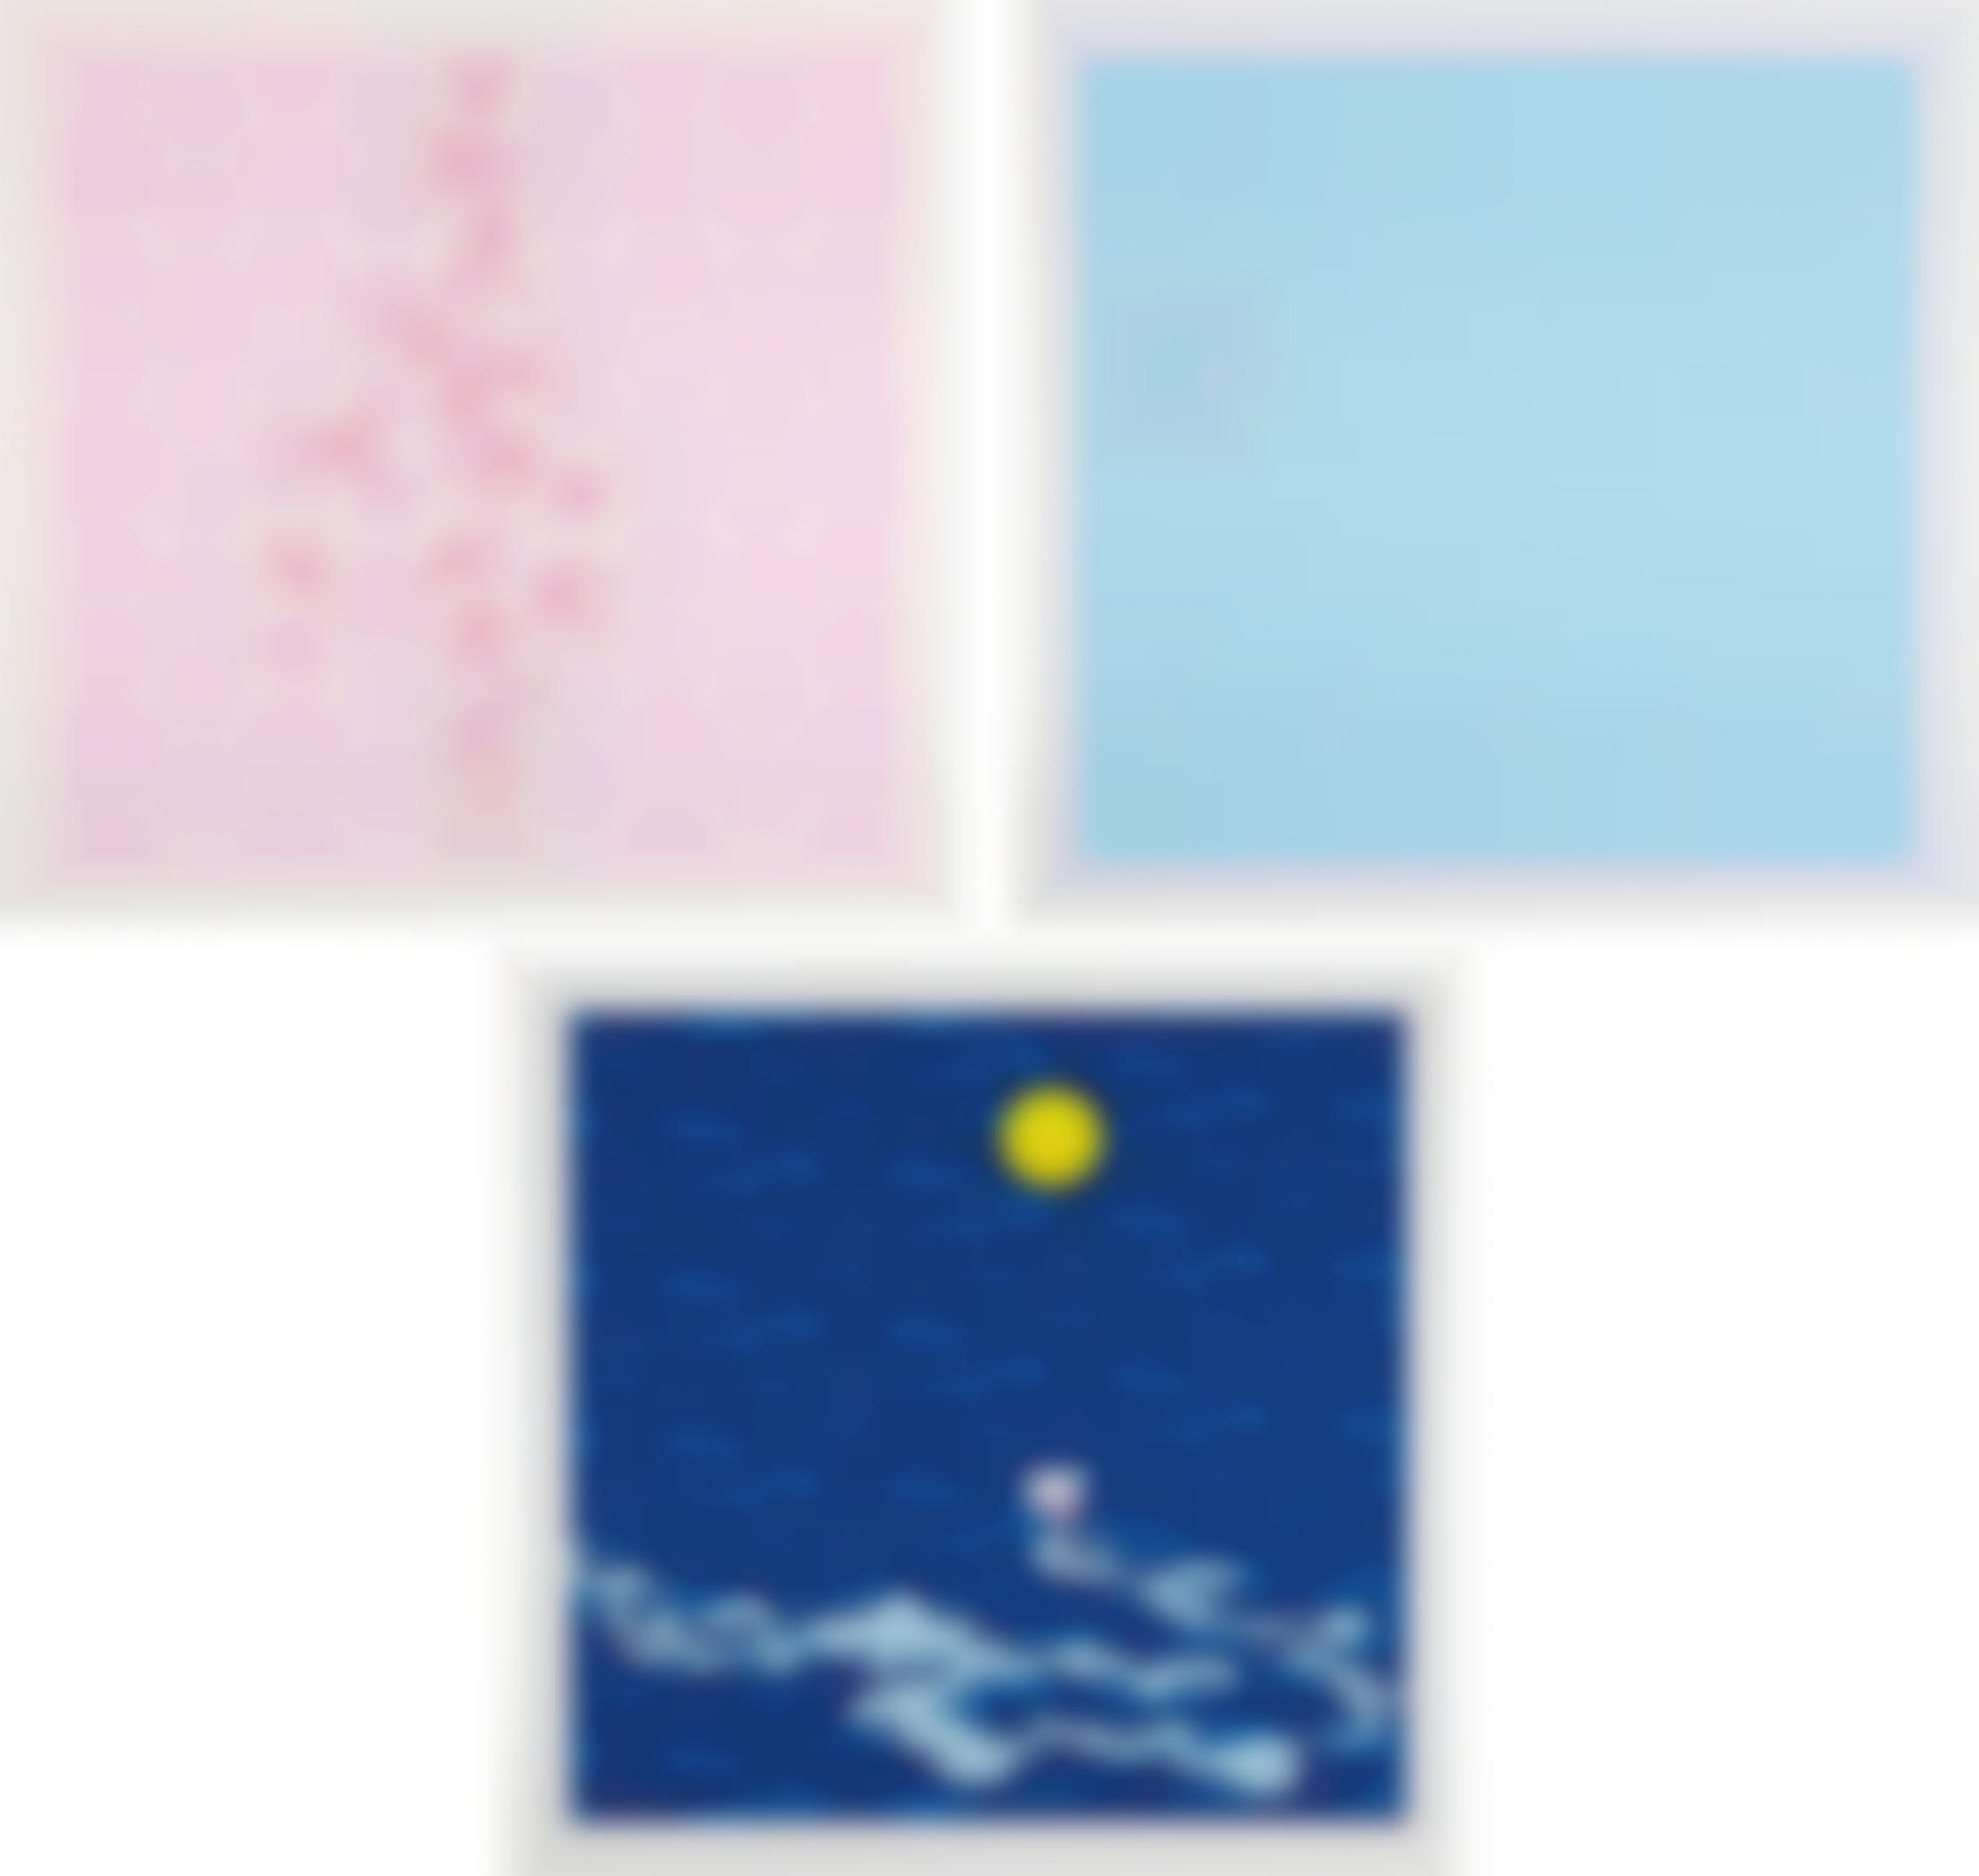 Takashi Murakami-Snow Moon Flower-2002